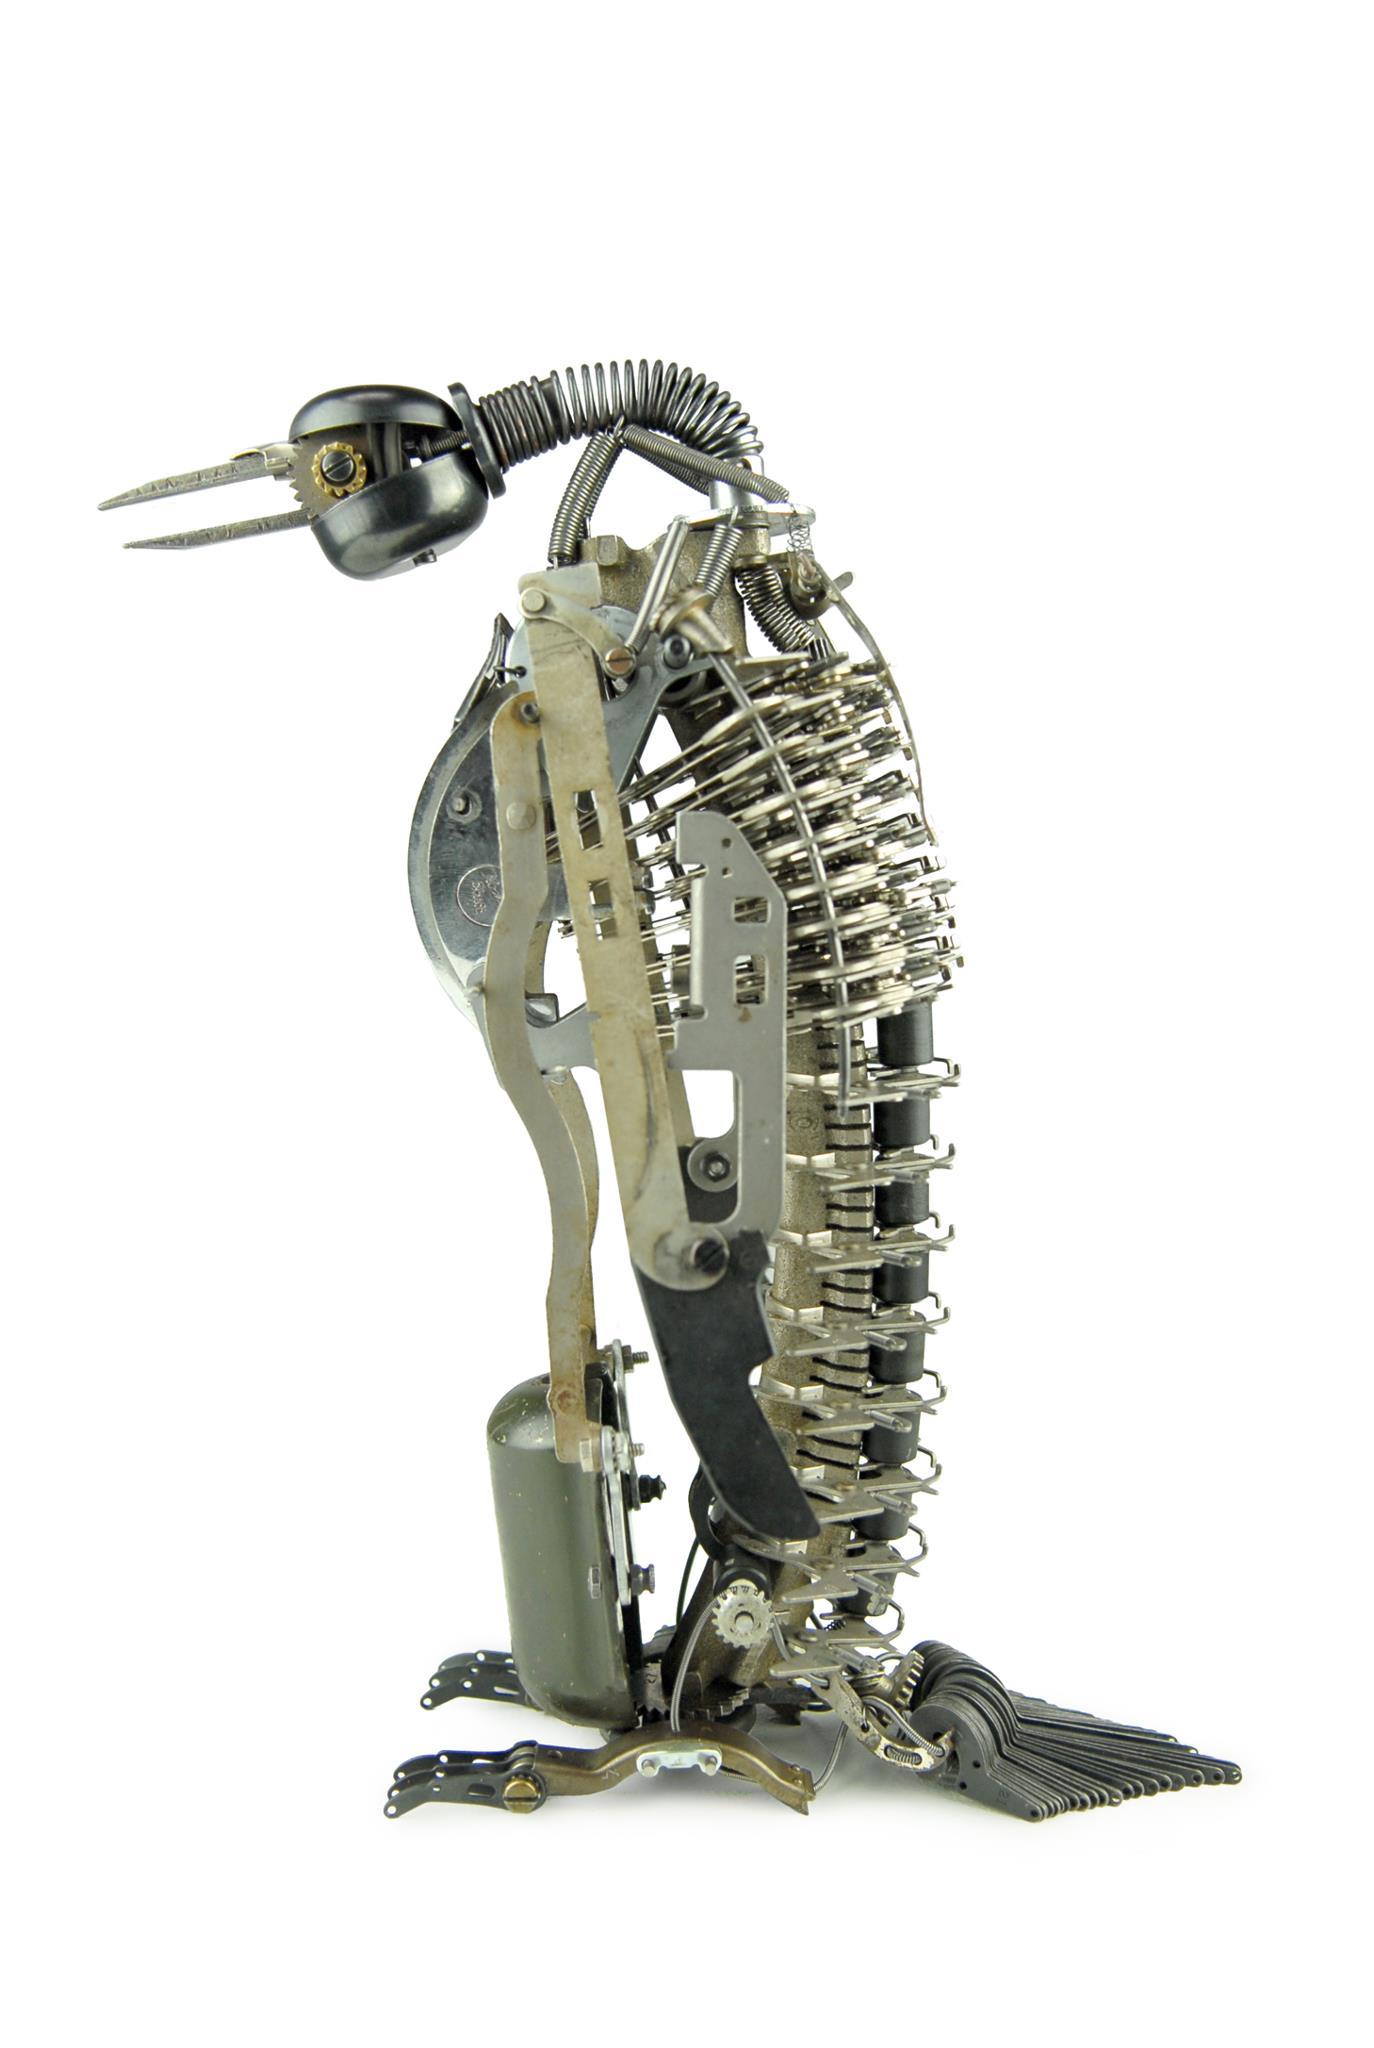 Jeremy Mayer – Typewriter assemblage sculpture – Penguin III